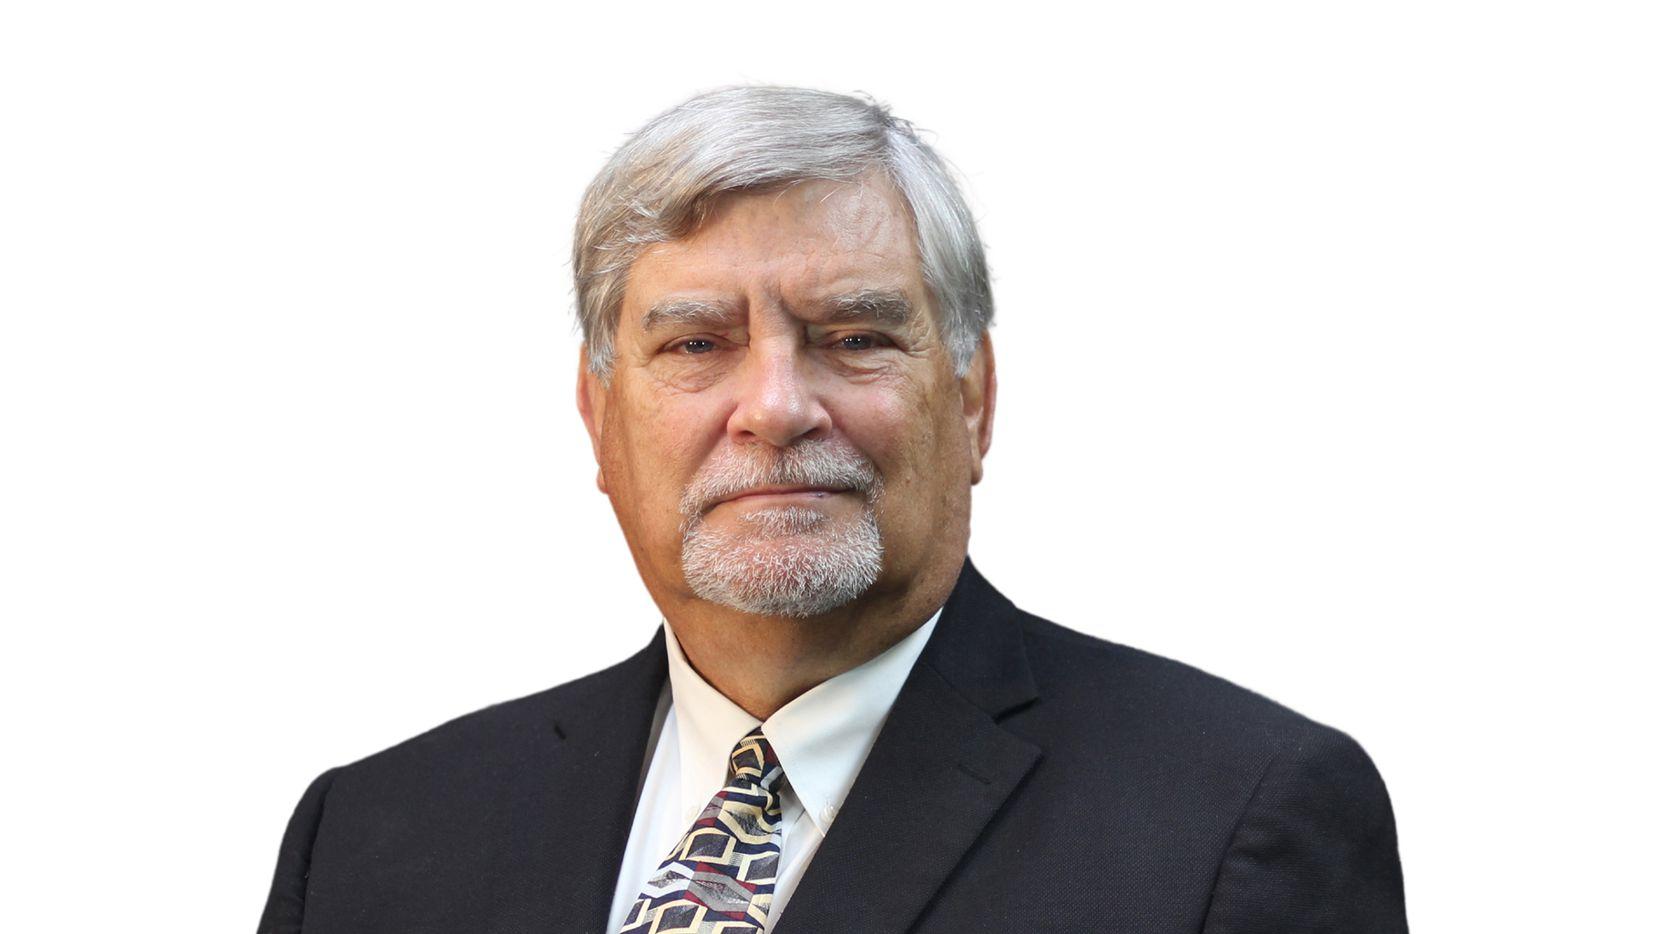 Terry Tremaine, 2020 President, MetroTex Association of Realtors